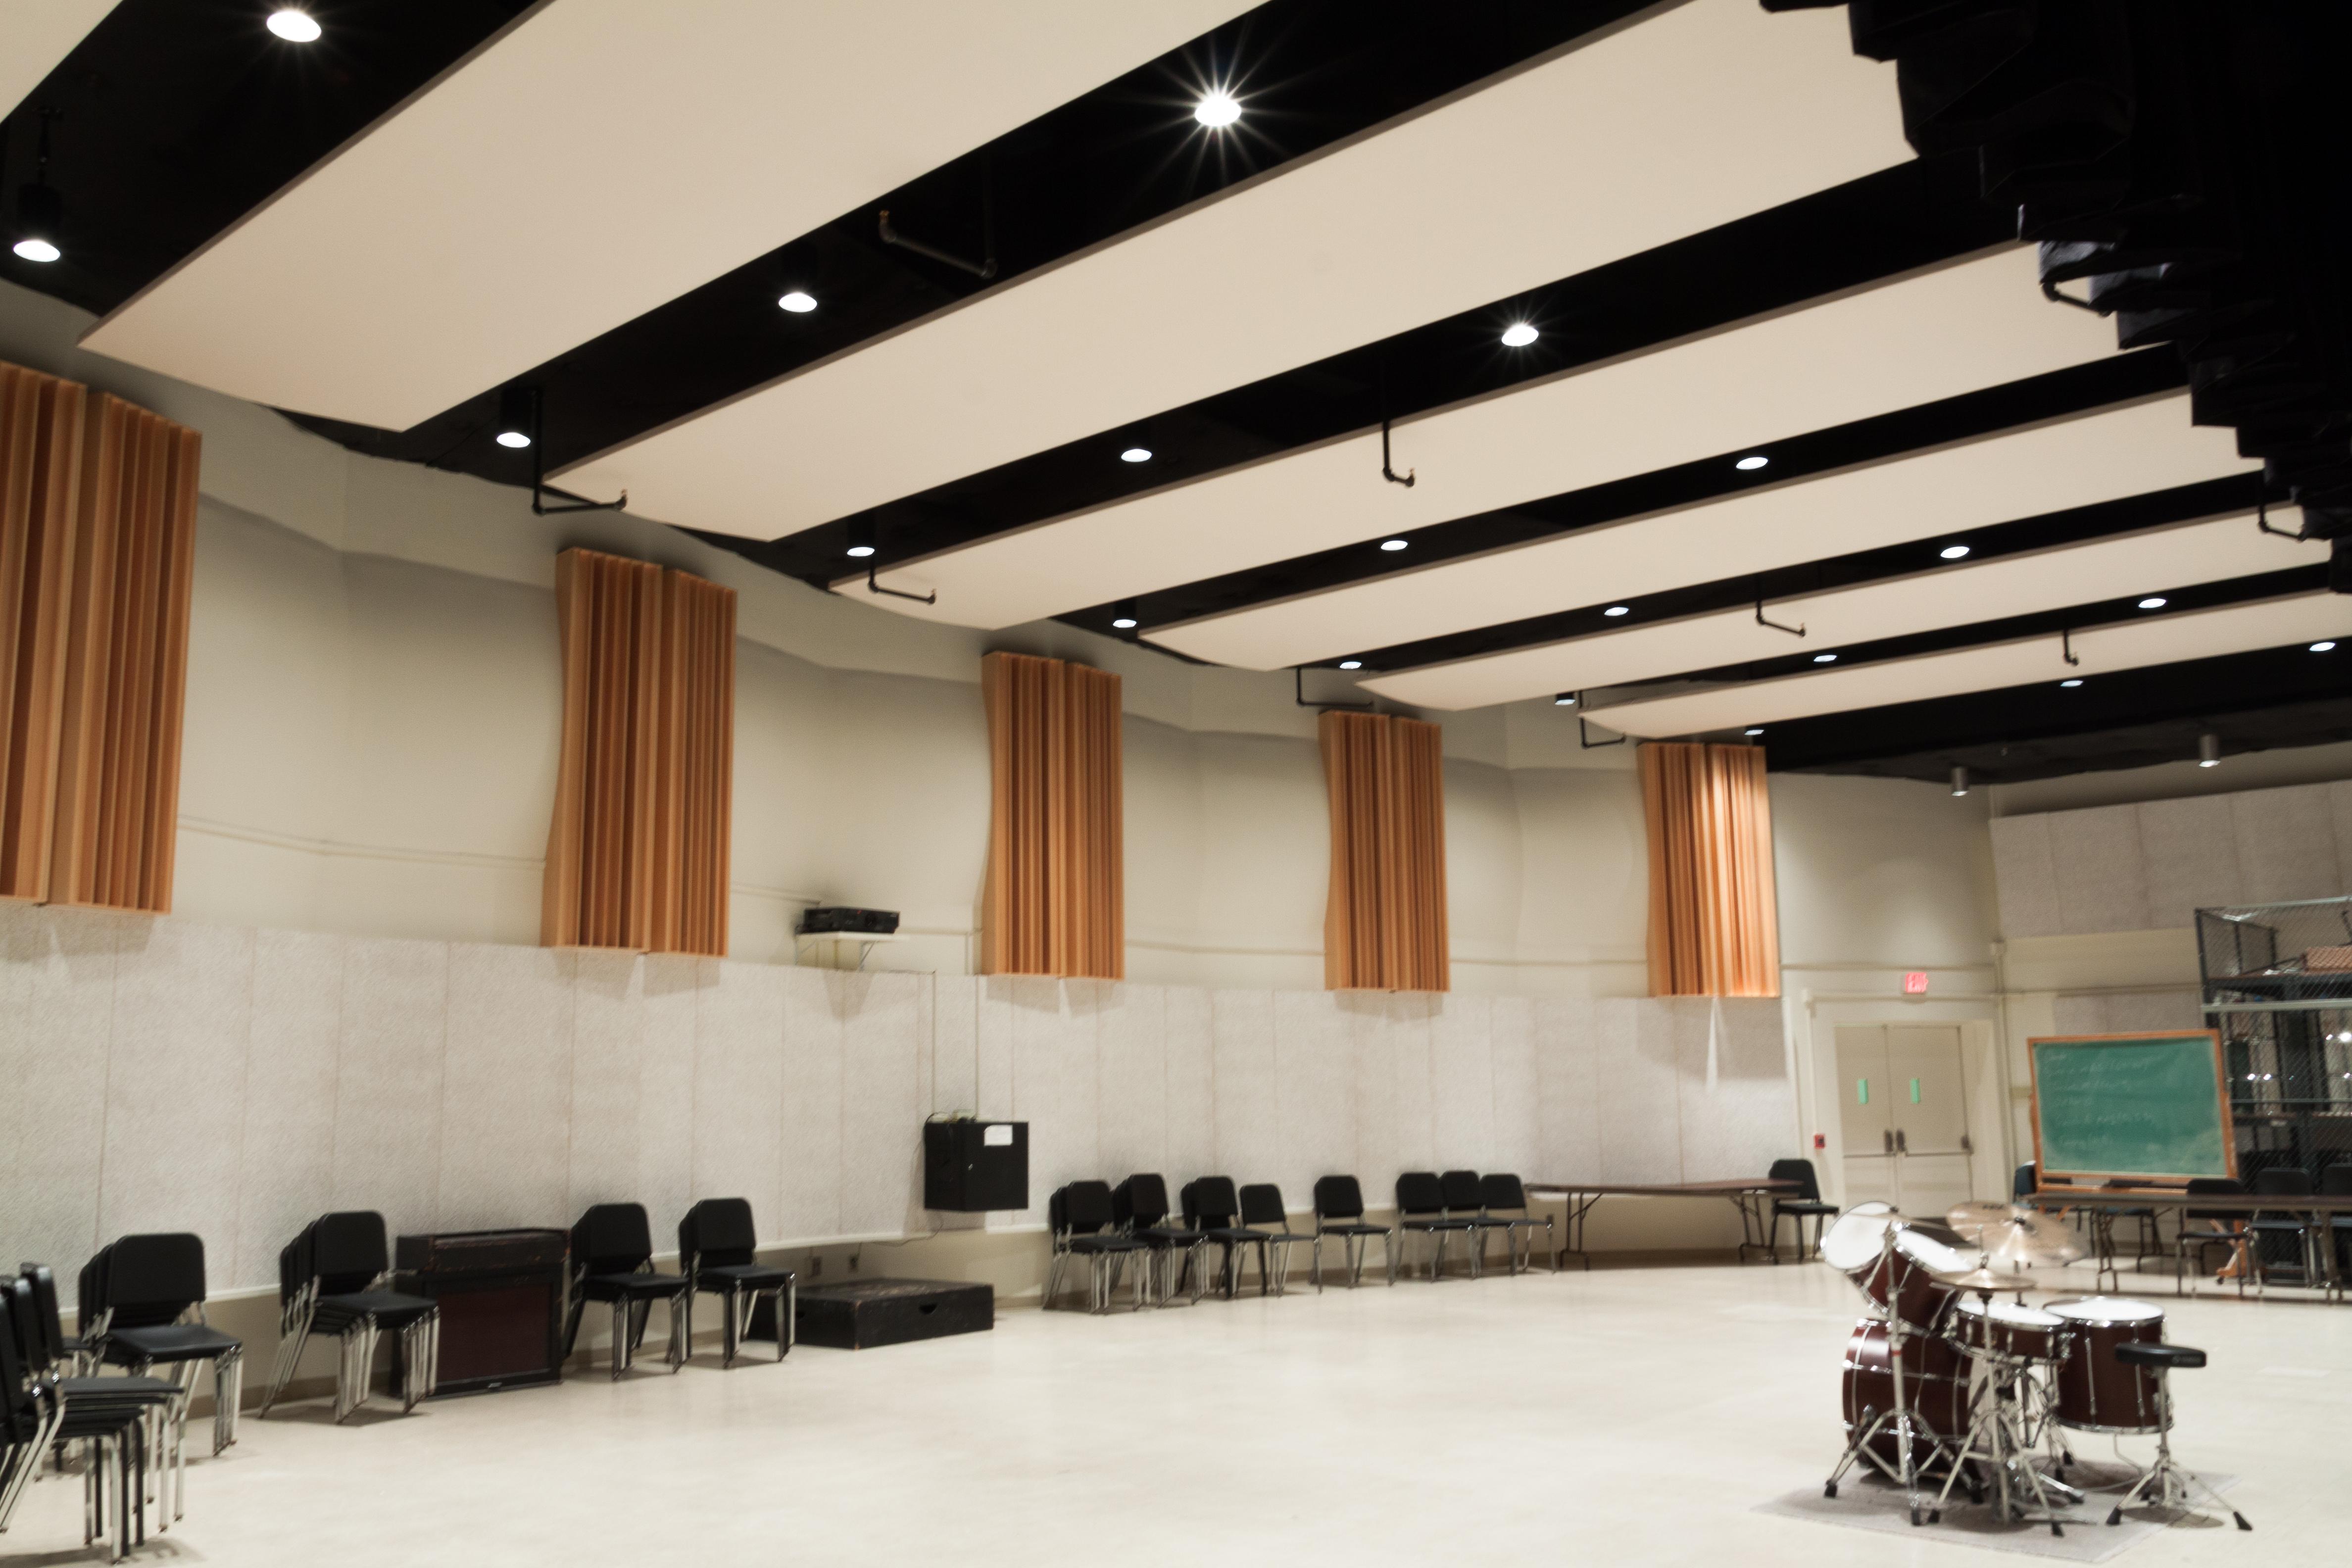 WVU CAC Rehearsal Hall 9-7-13-11